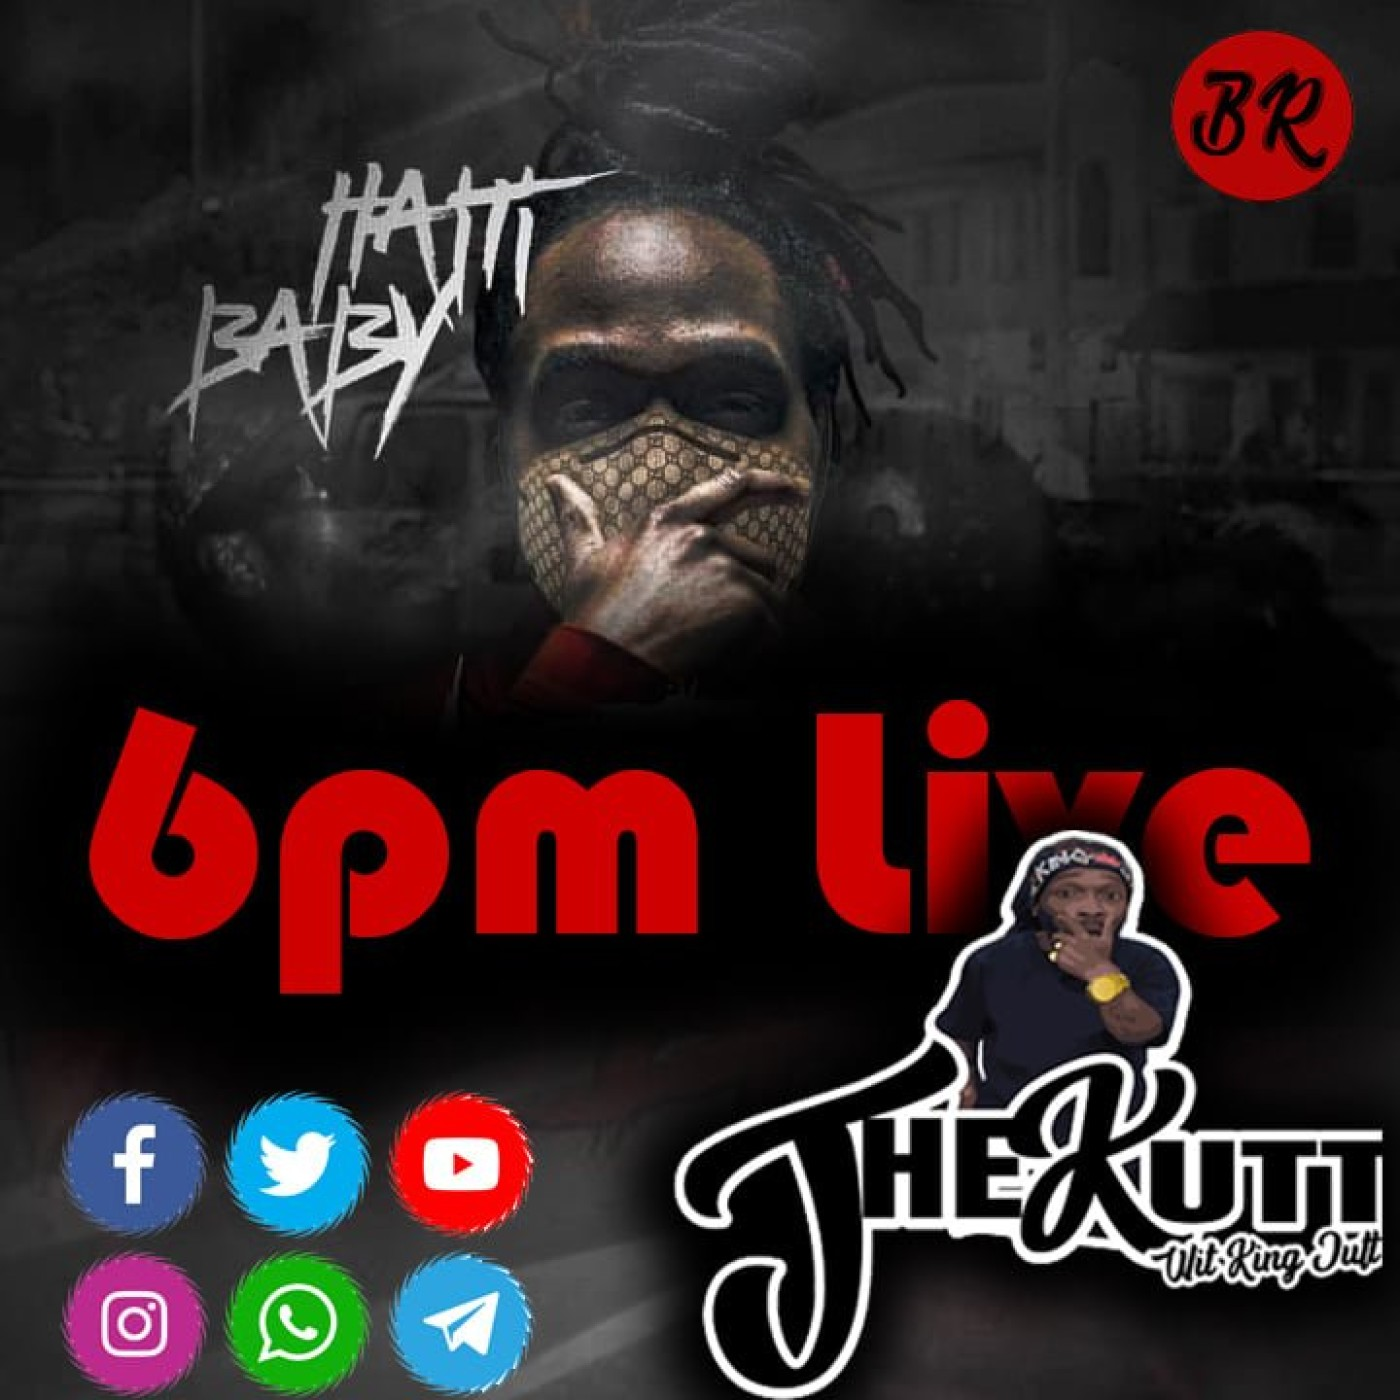 The Kutt Wit King Jutt Episode 13 wit Haiti Baby